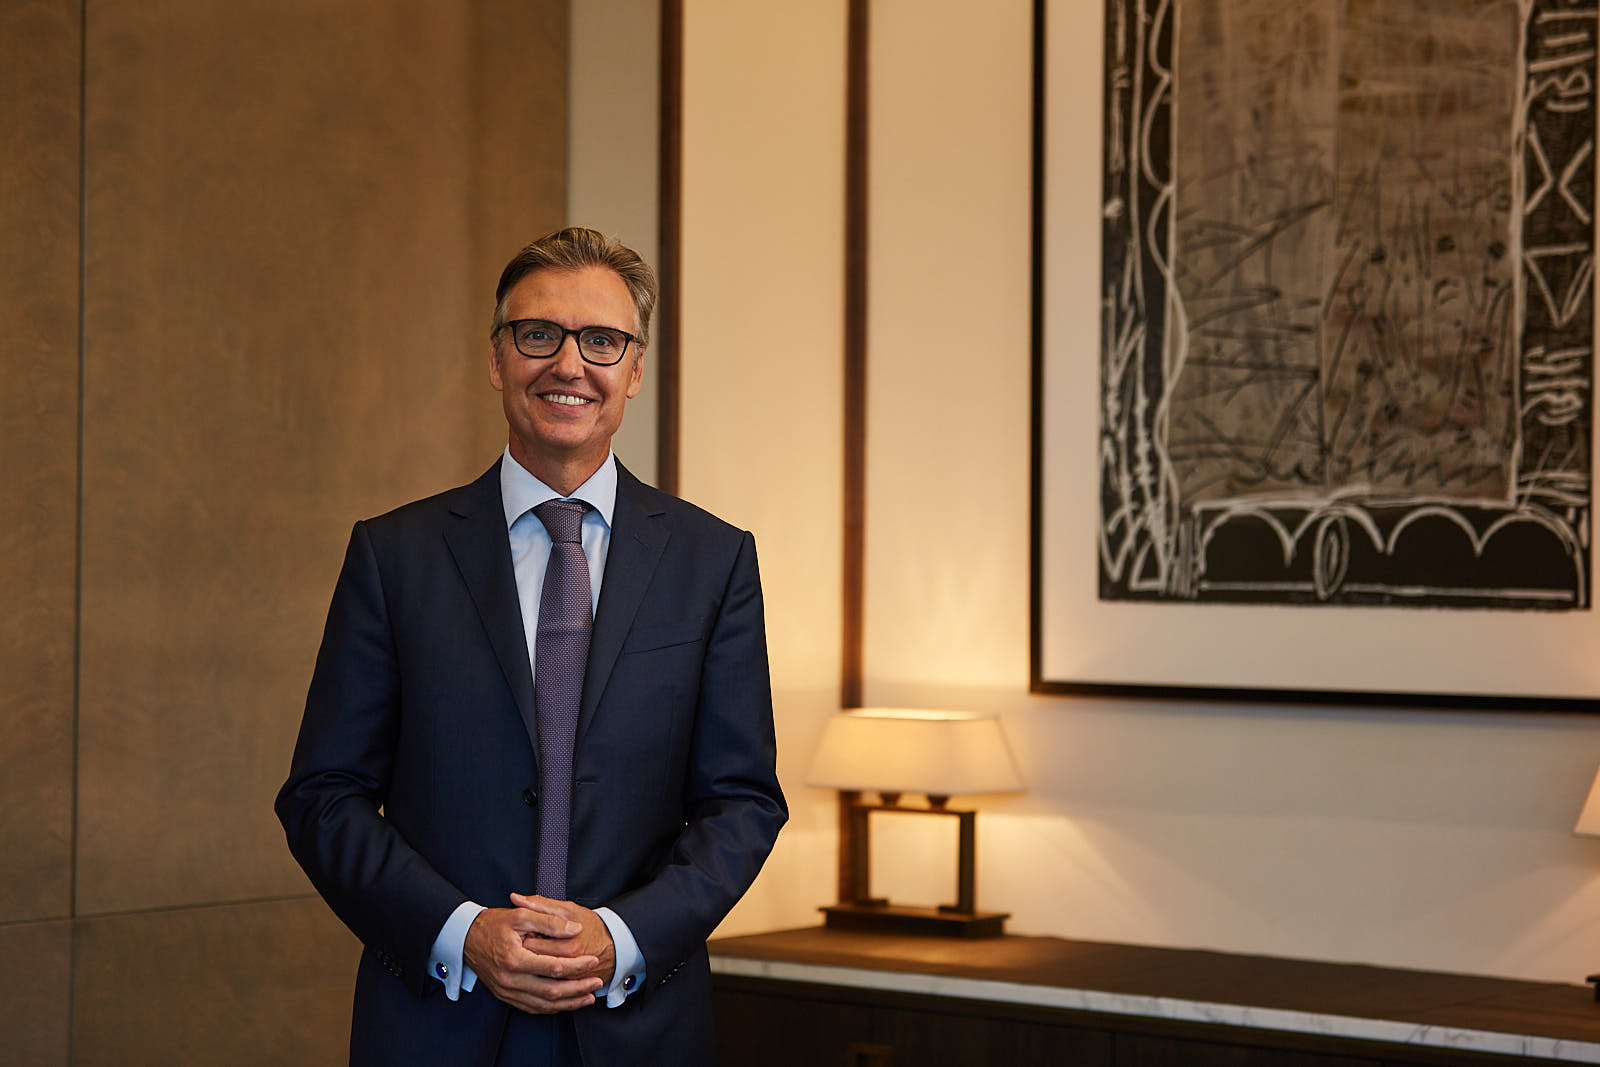 Barclays Portraits 2018